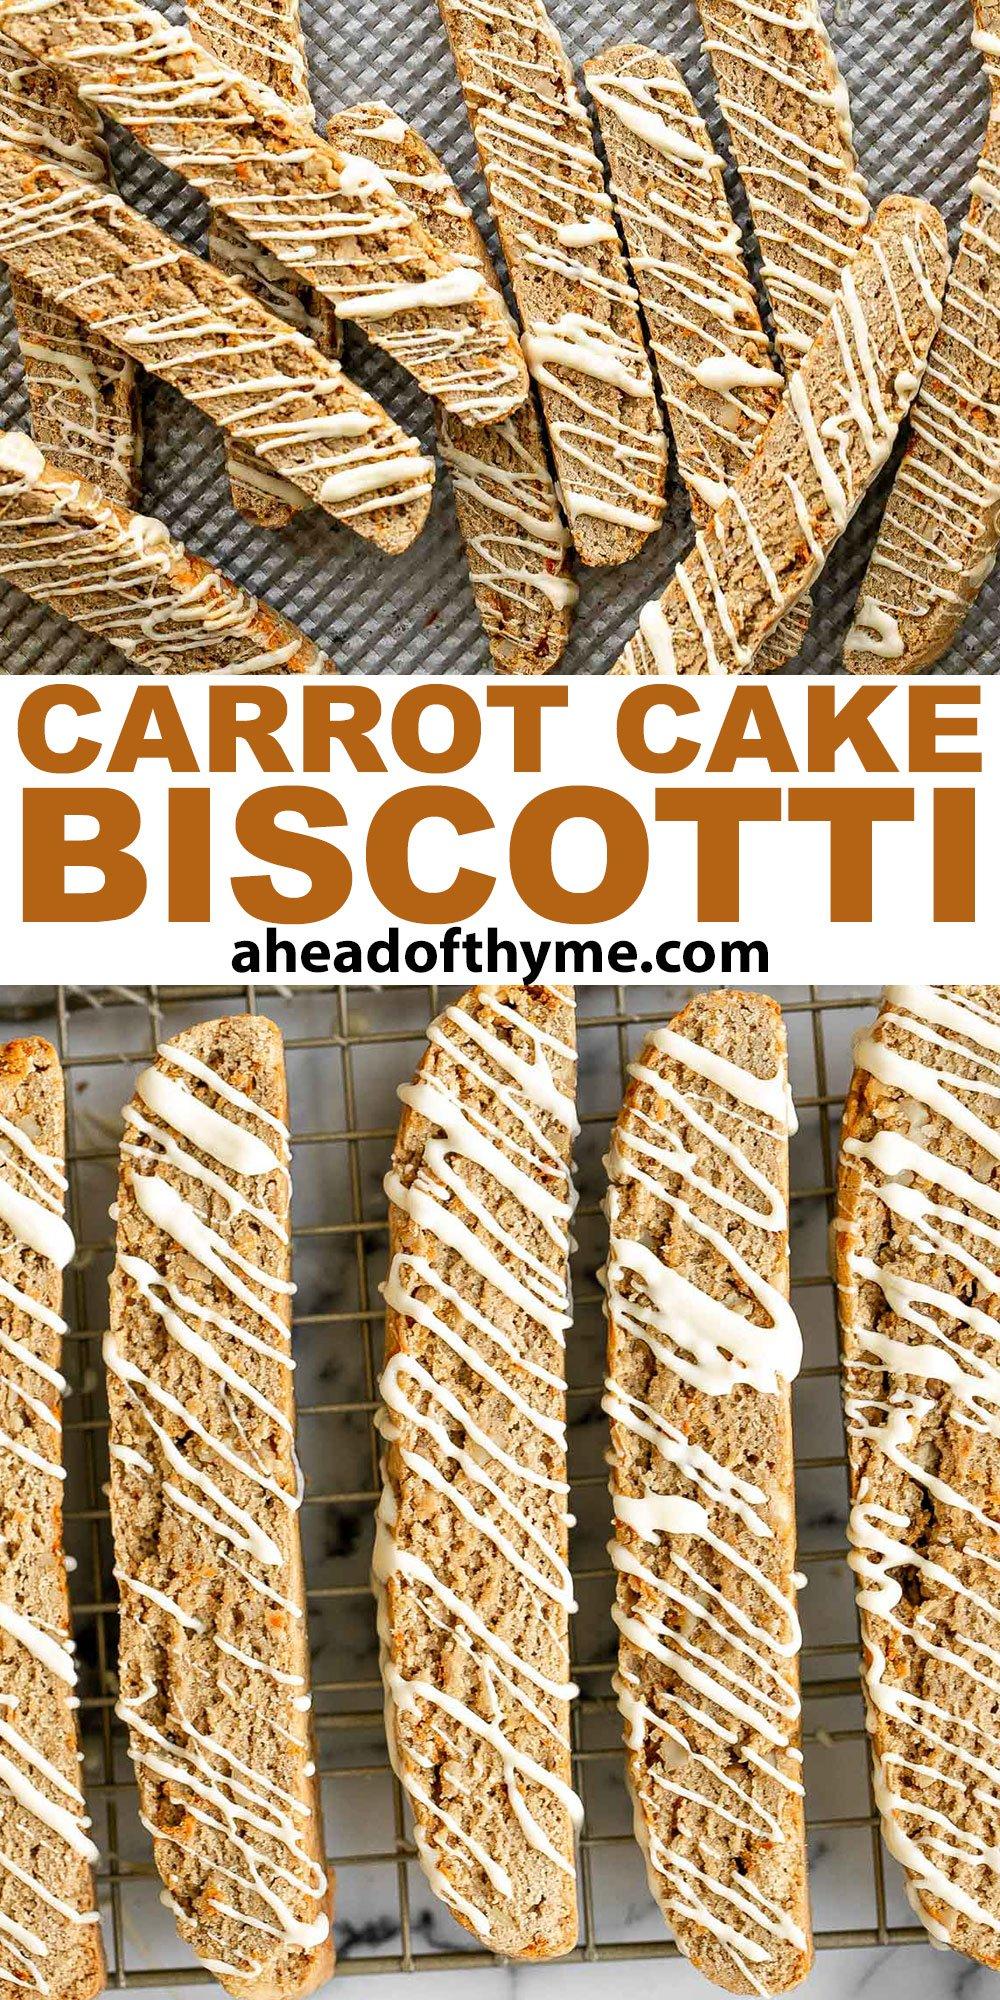 Carrot Cake Biscotti